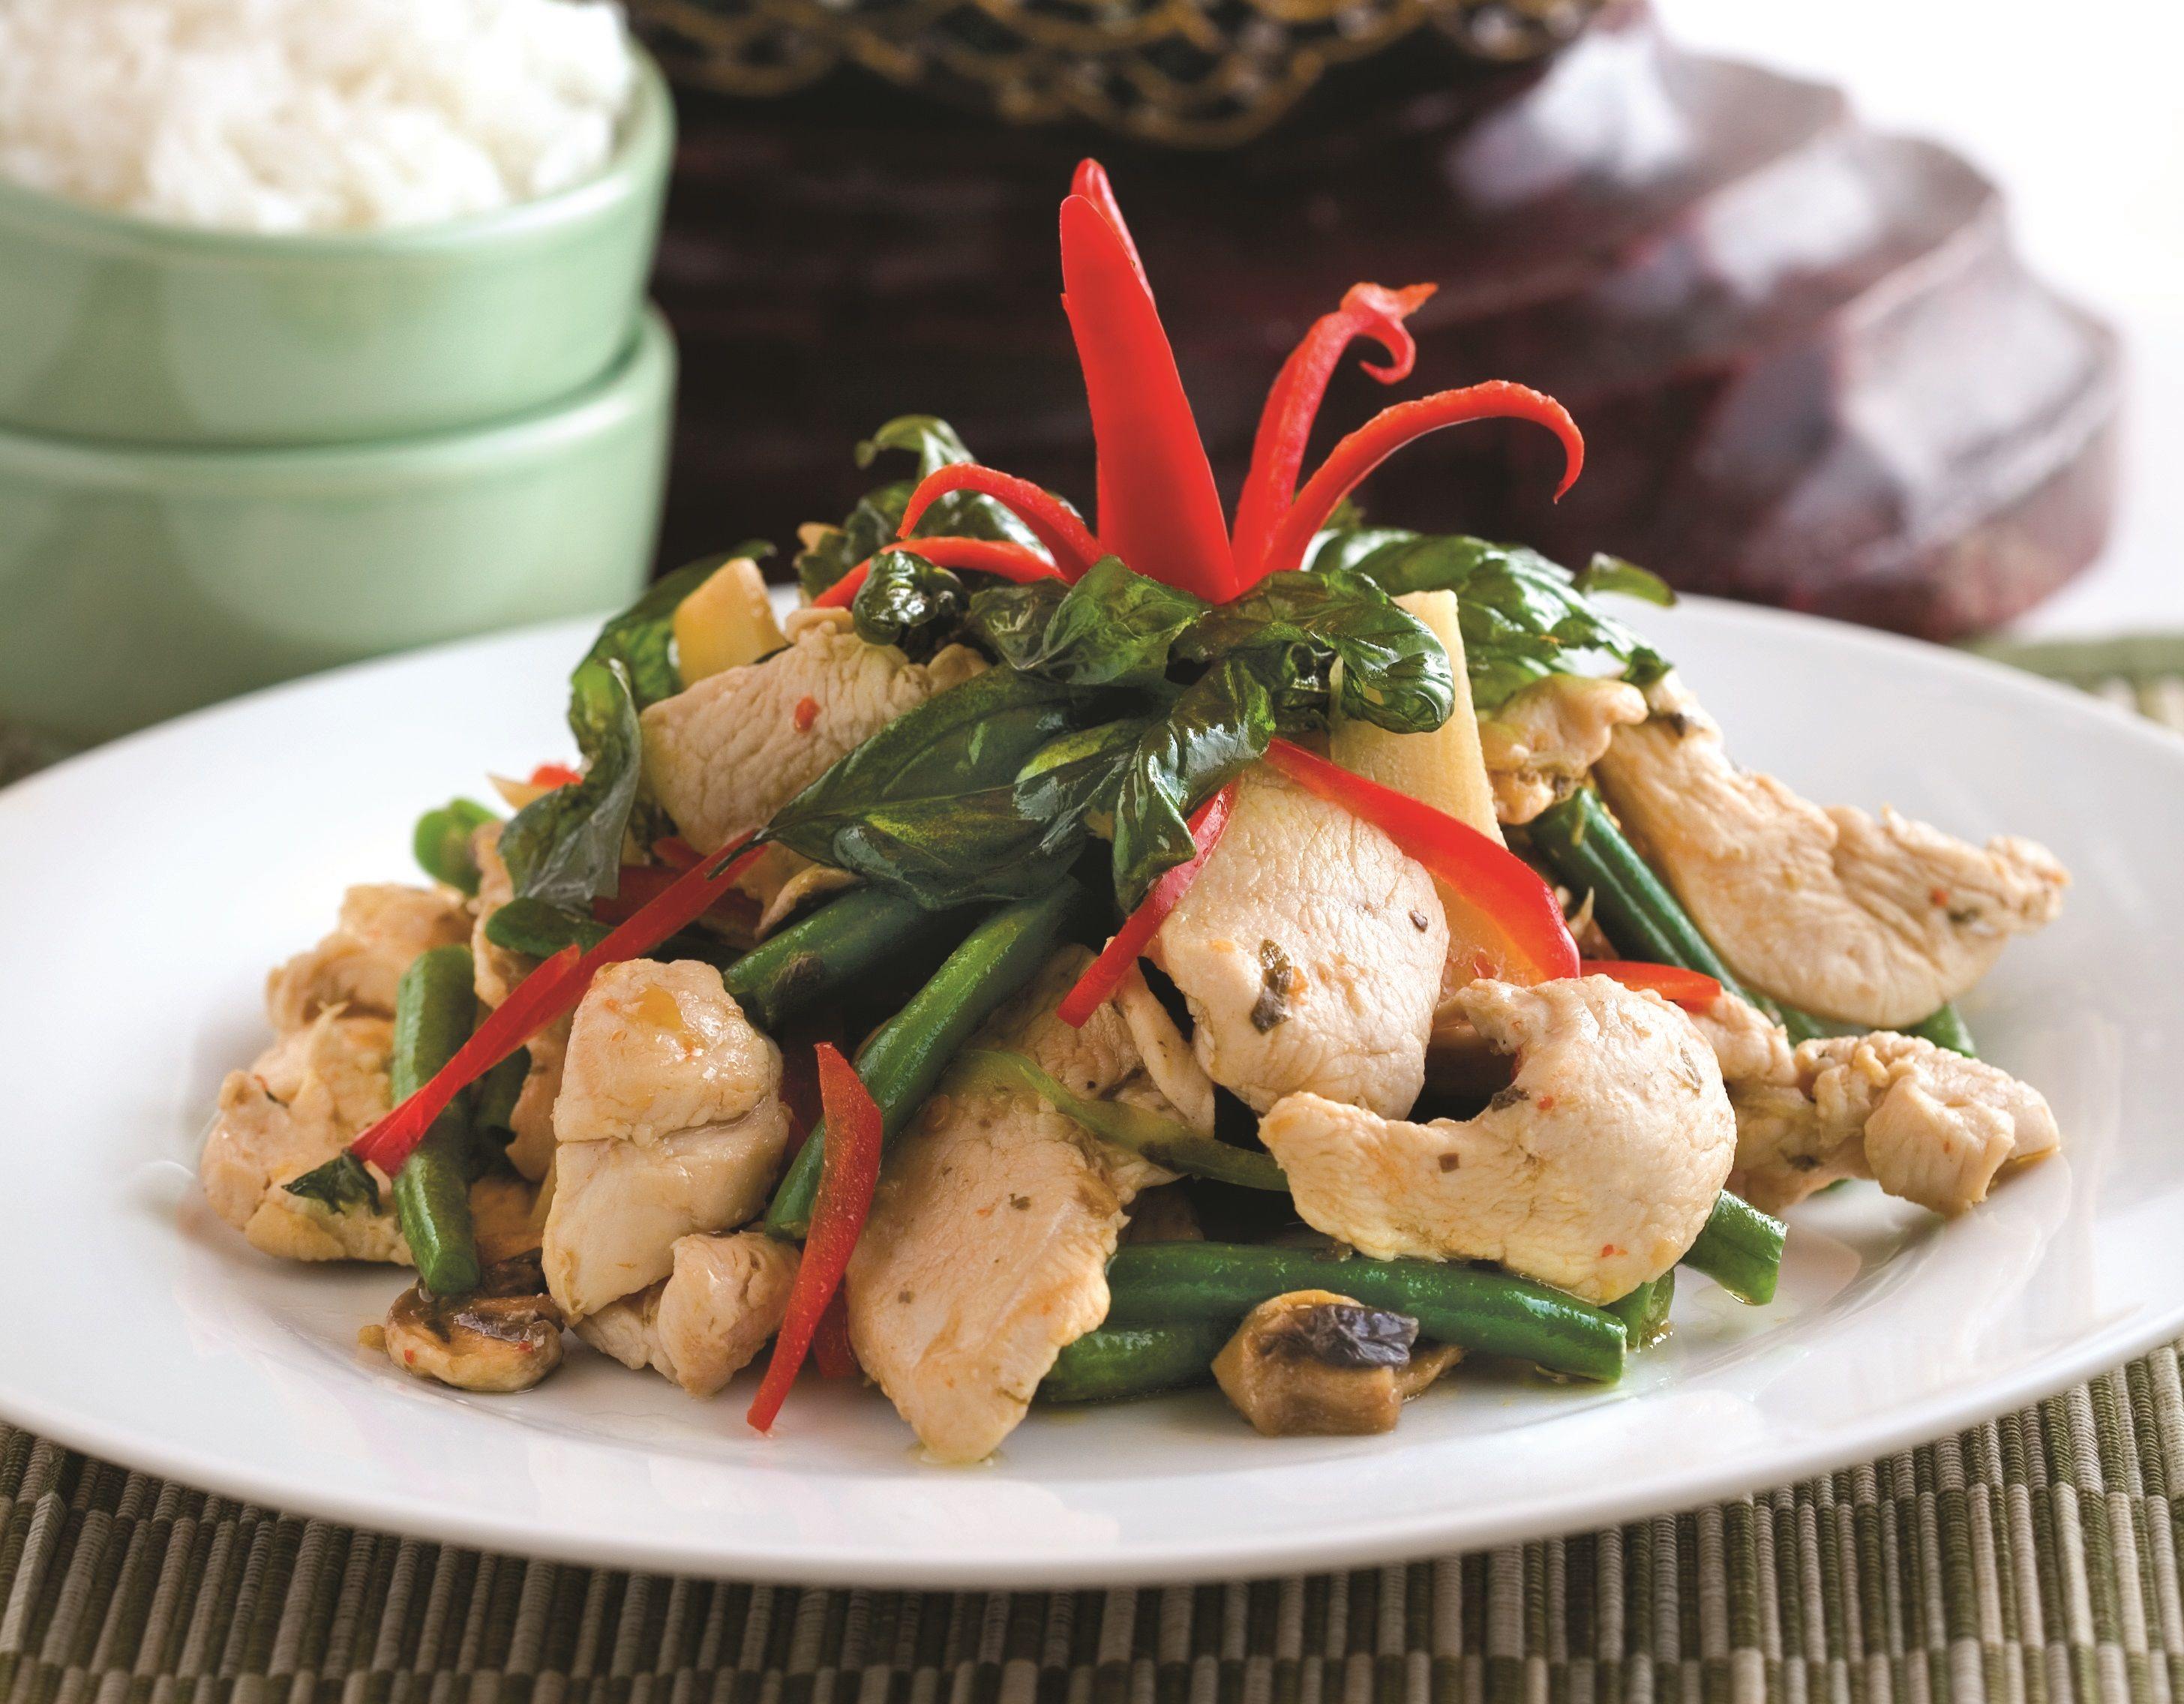 5 surefire ways to warm up with thai food thai curry soup thai warm up with thai food this winter with spicy thai recipes warming thai ingredients forumfinder Choice Image